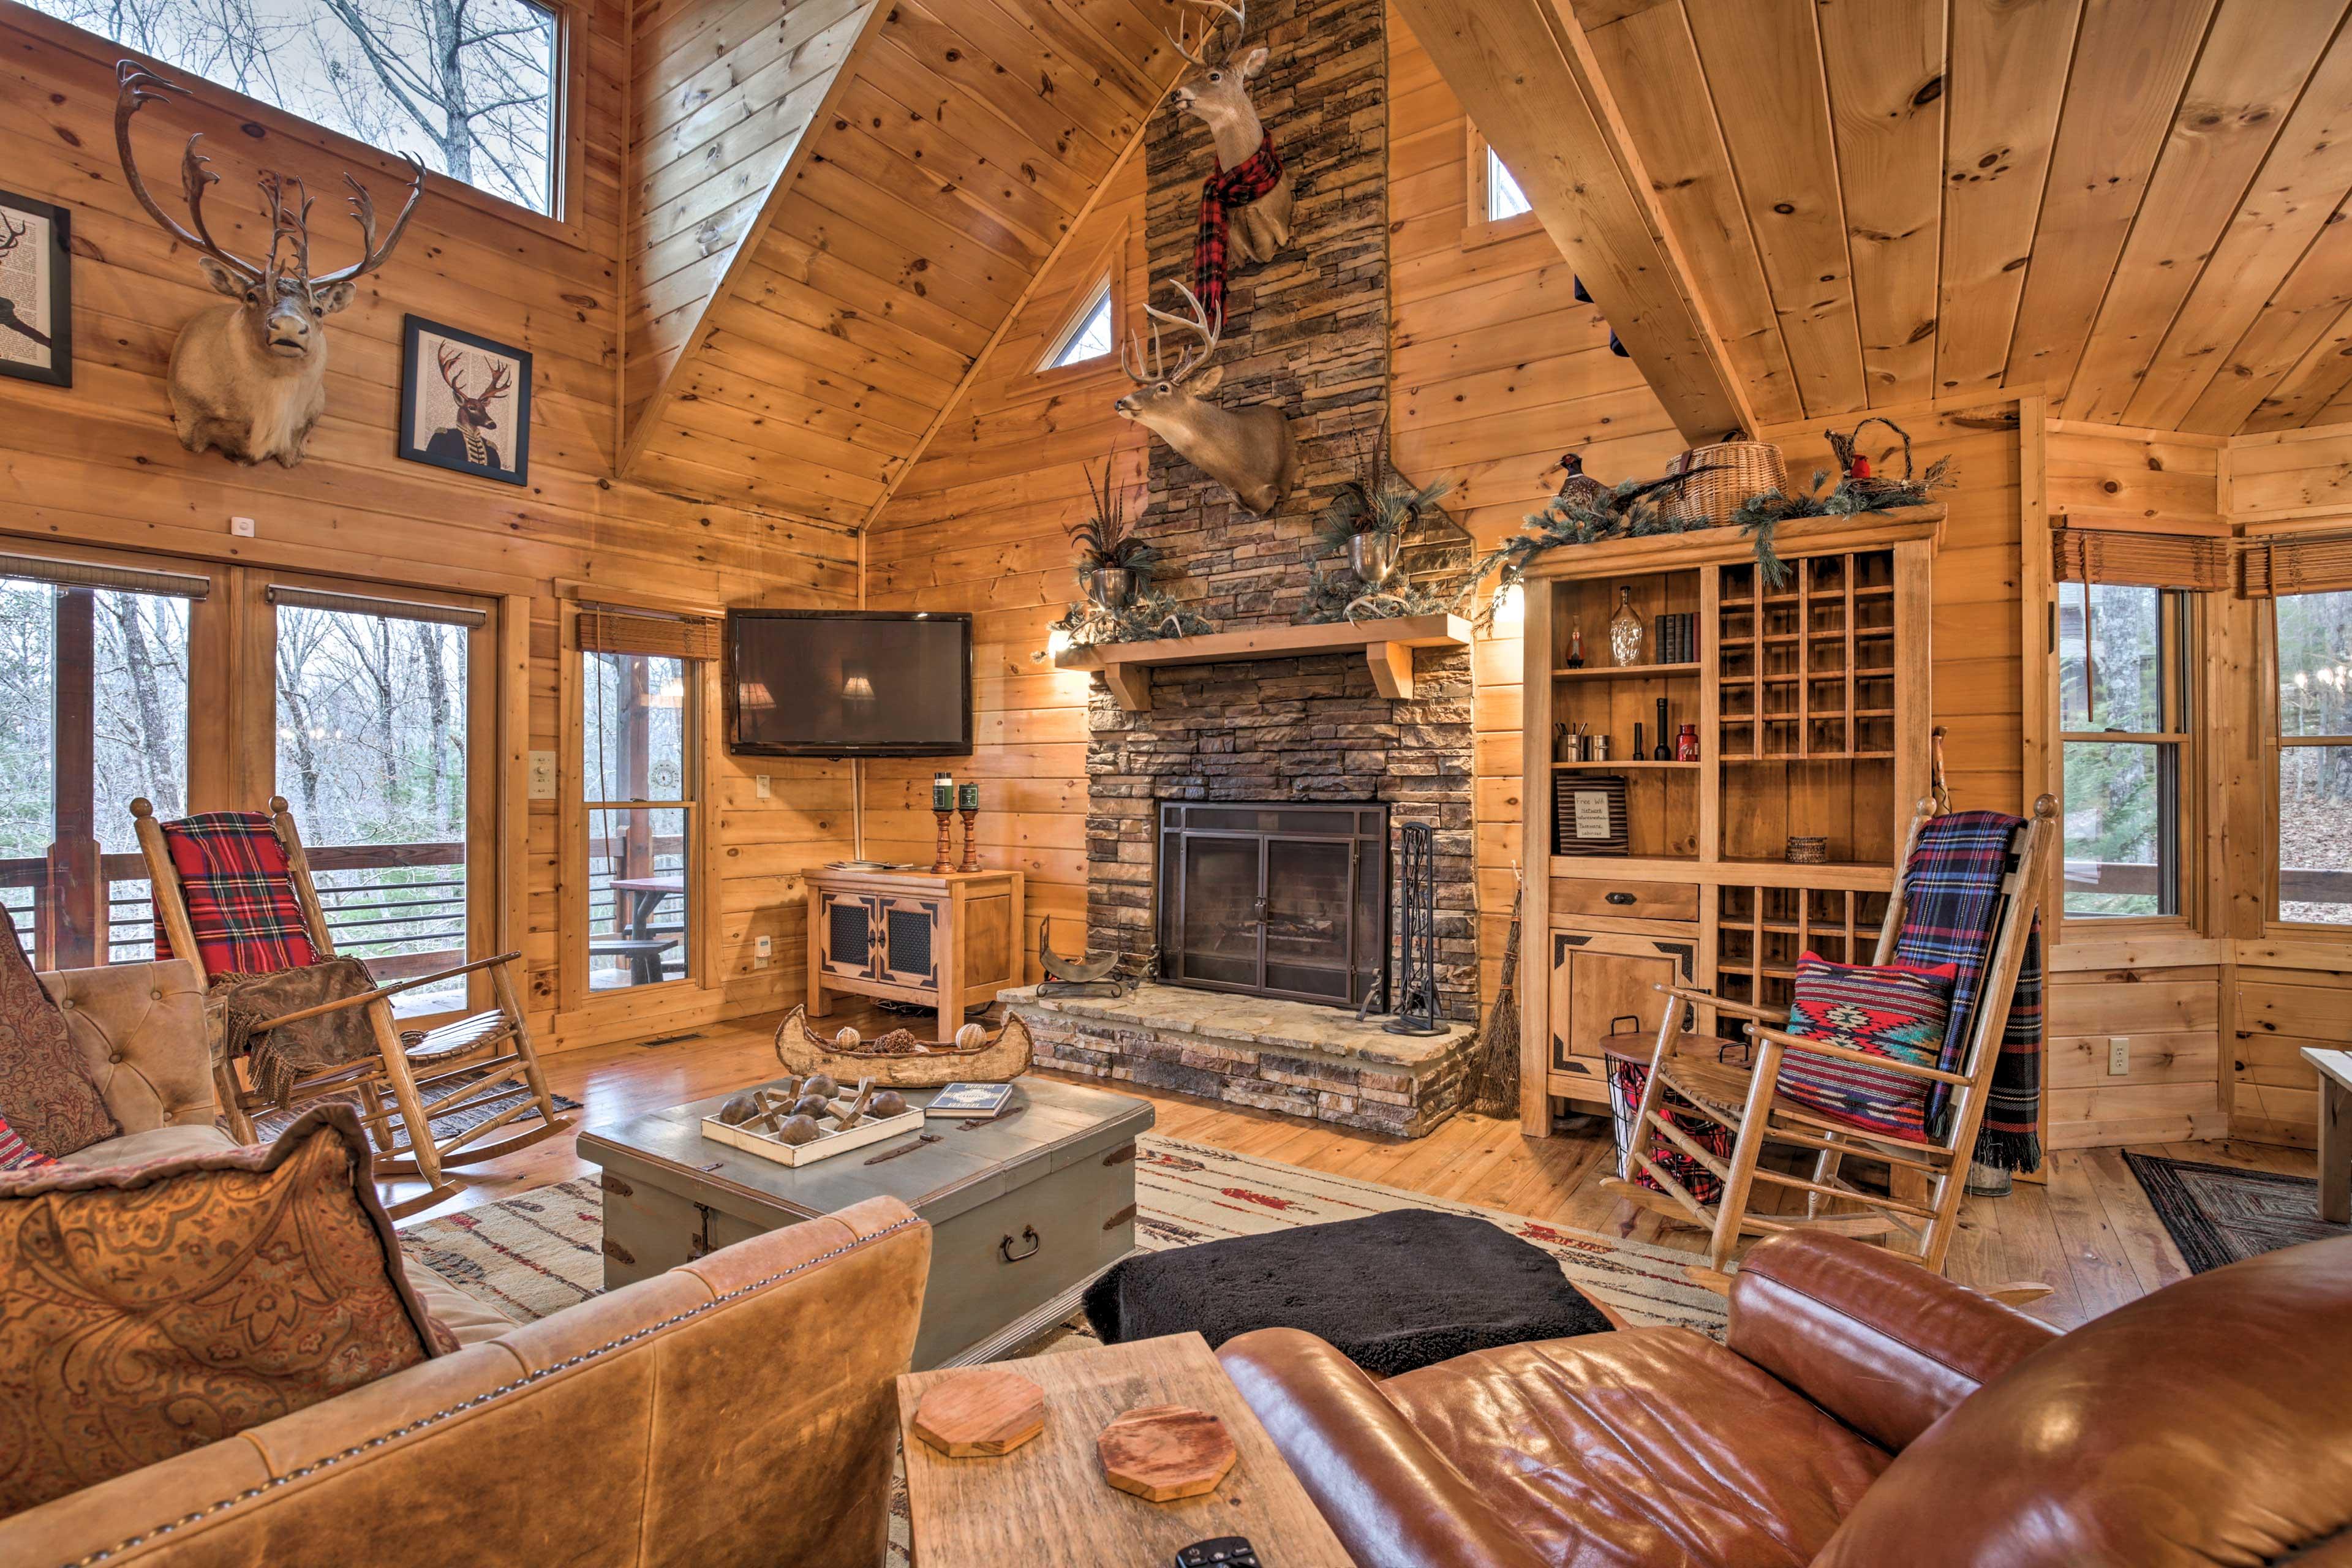 Living Room | Free WiFi | Wood-Burning Fireplace